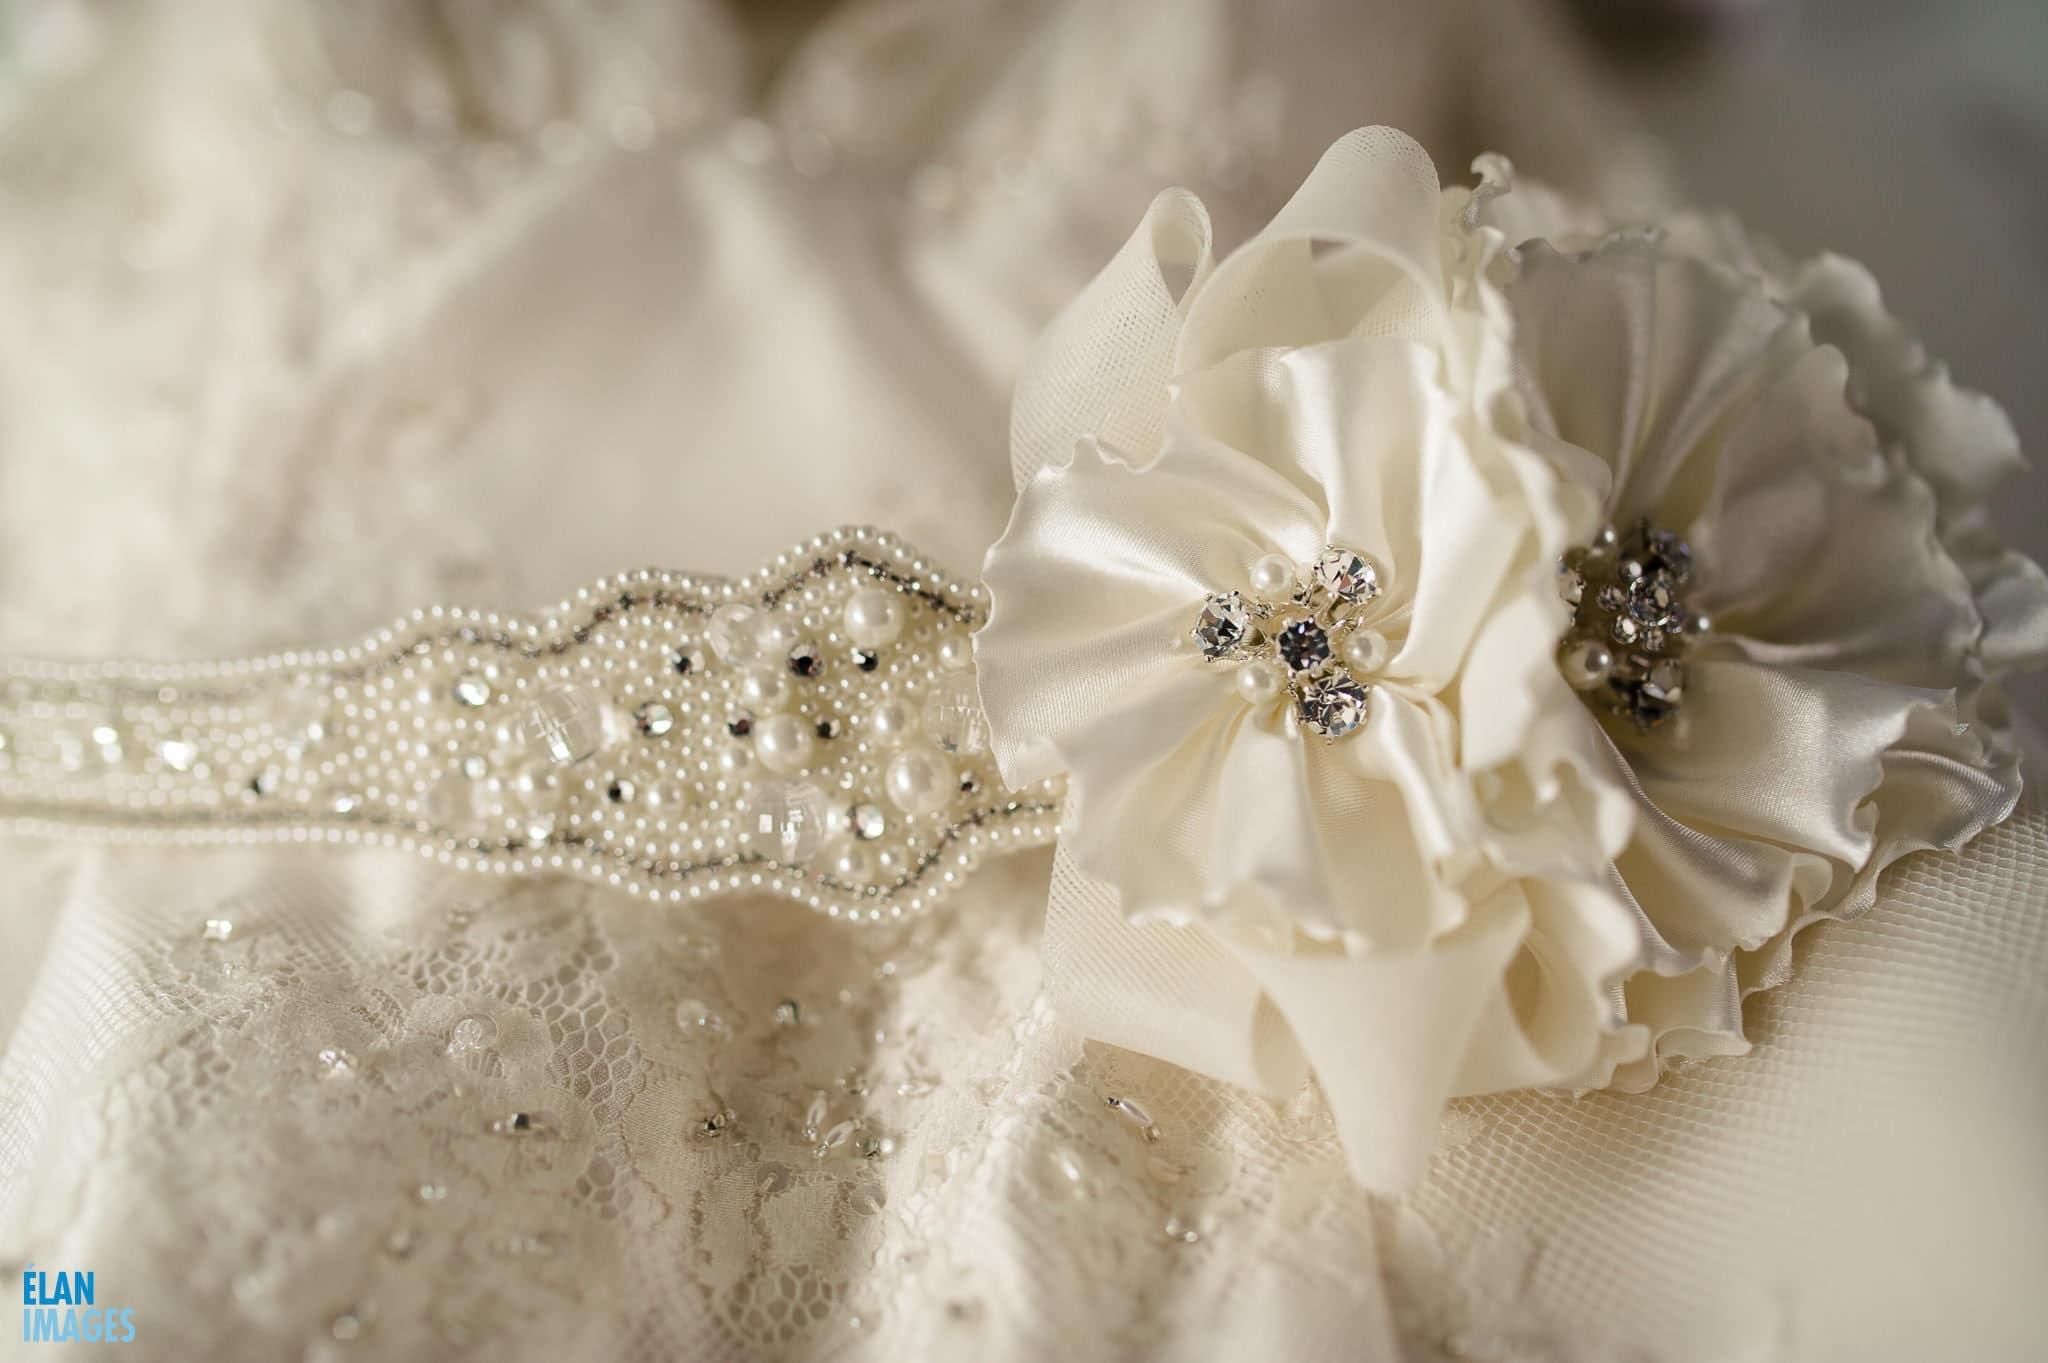 Wedding at leigh park hotel -009